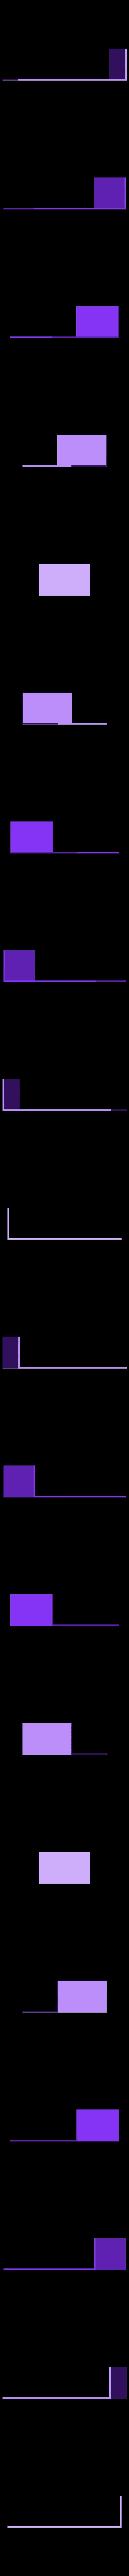 xpi_nousbhub#r1.stl Download STL file Raspberry Pi 4 case XPI • 3D printing template, Steenberg